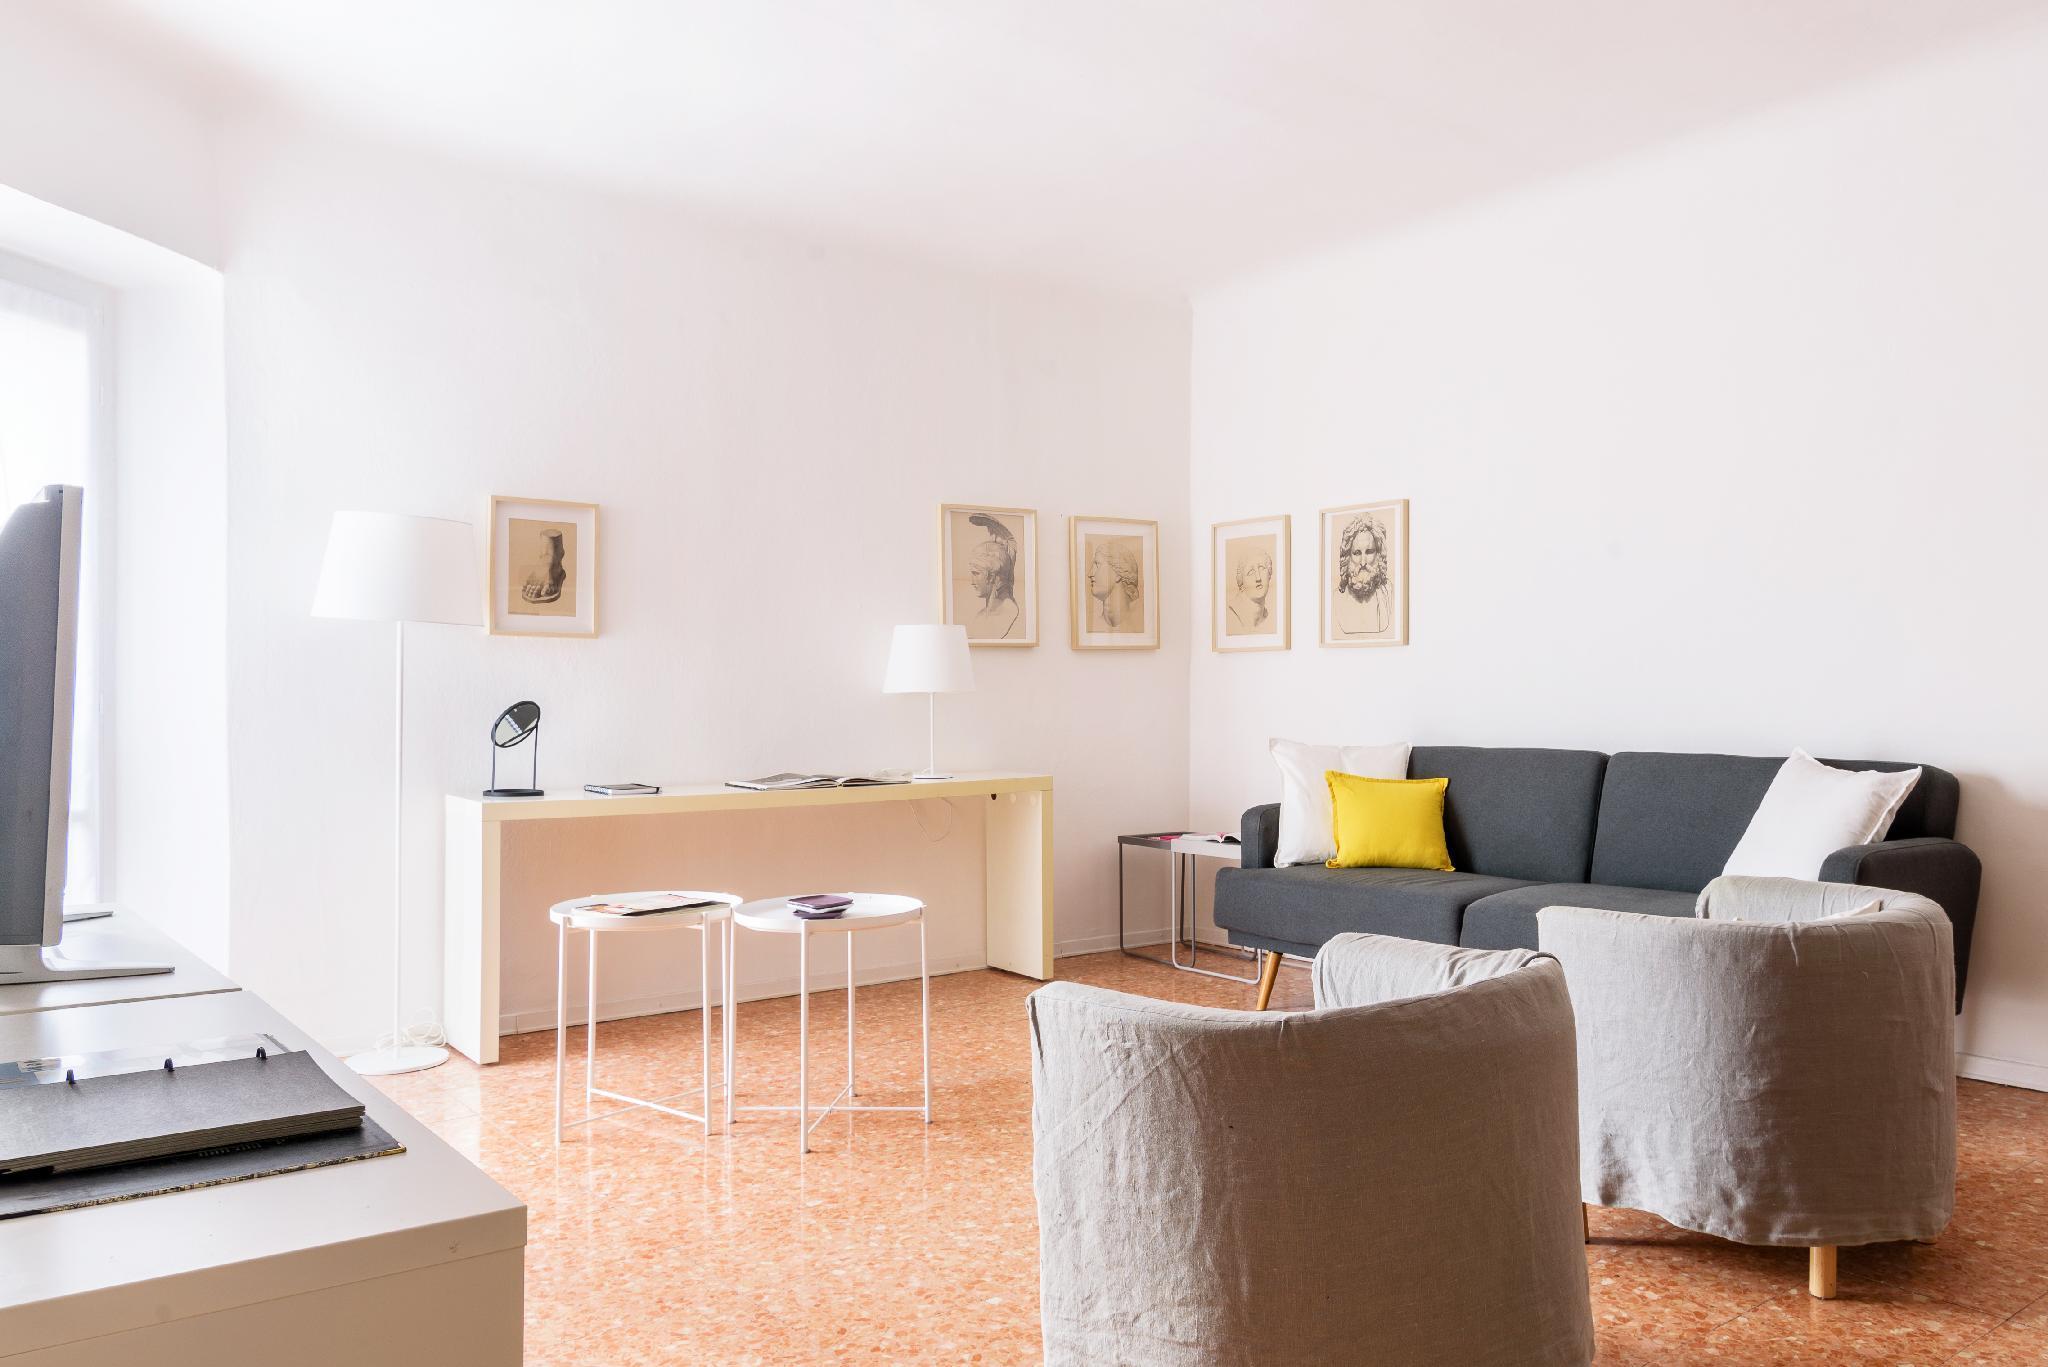 Siri Master Guest apartment